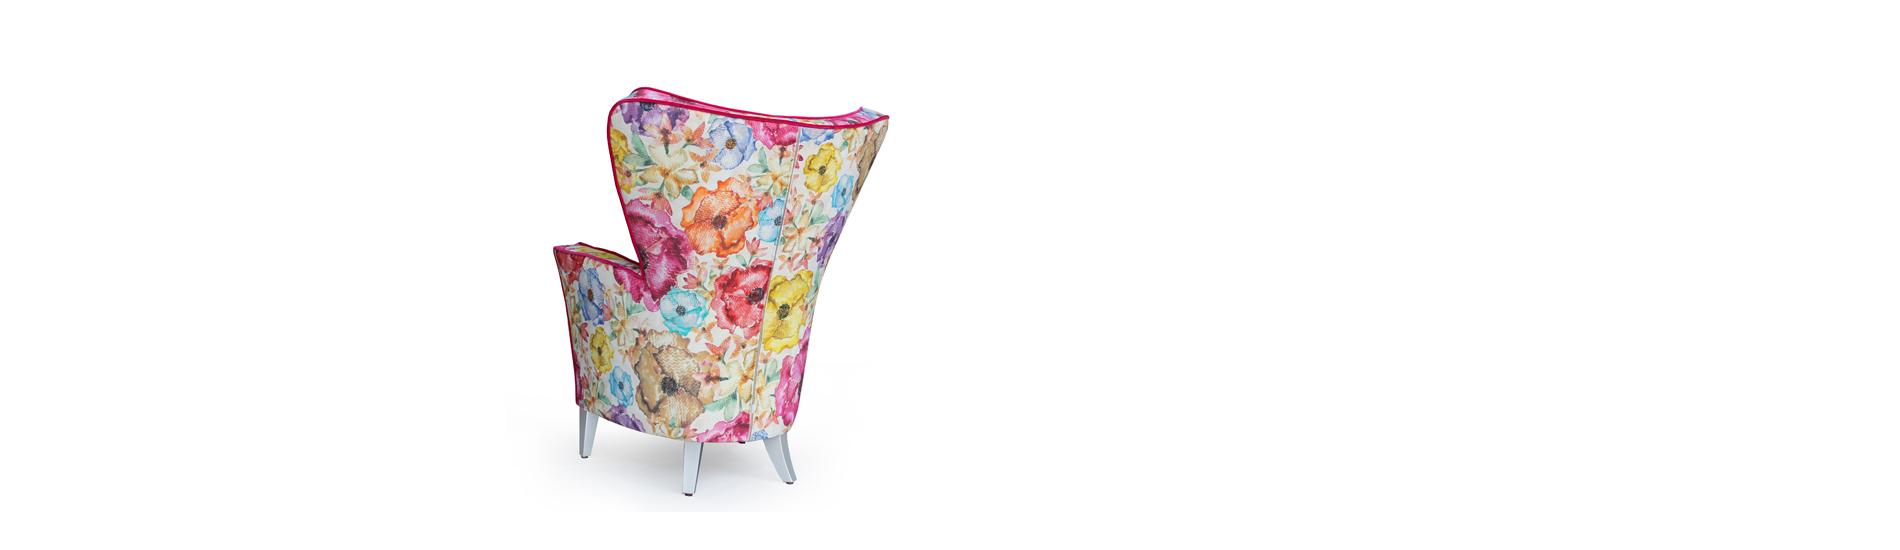 Induflex Upholstered Furniture # Muebles Santa Rua